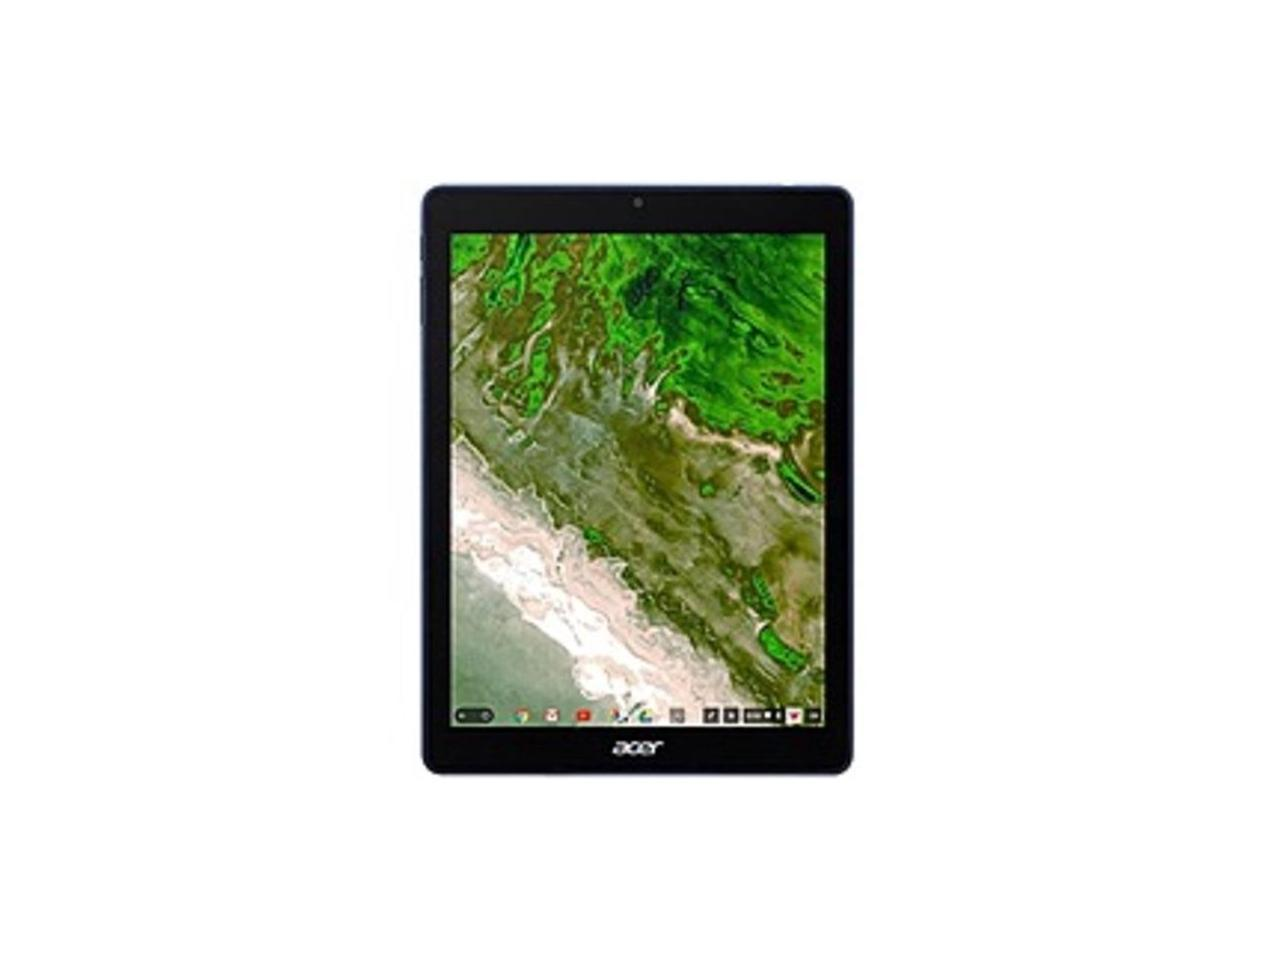 Details about Acer Chromebook Tab 10 D651N-K9WT Rockchip OP1 RK3399 (1 80  GHz) 4 GB LPDDR3 Mem